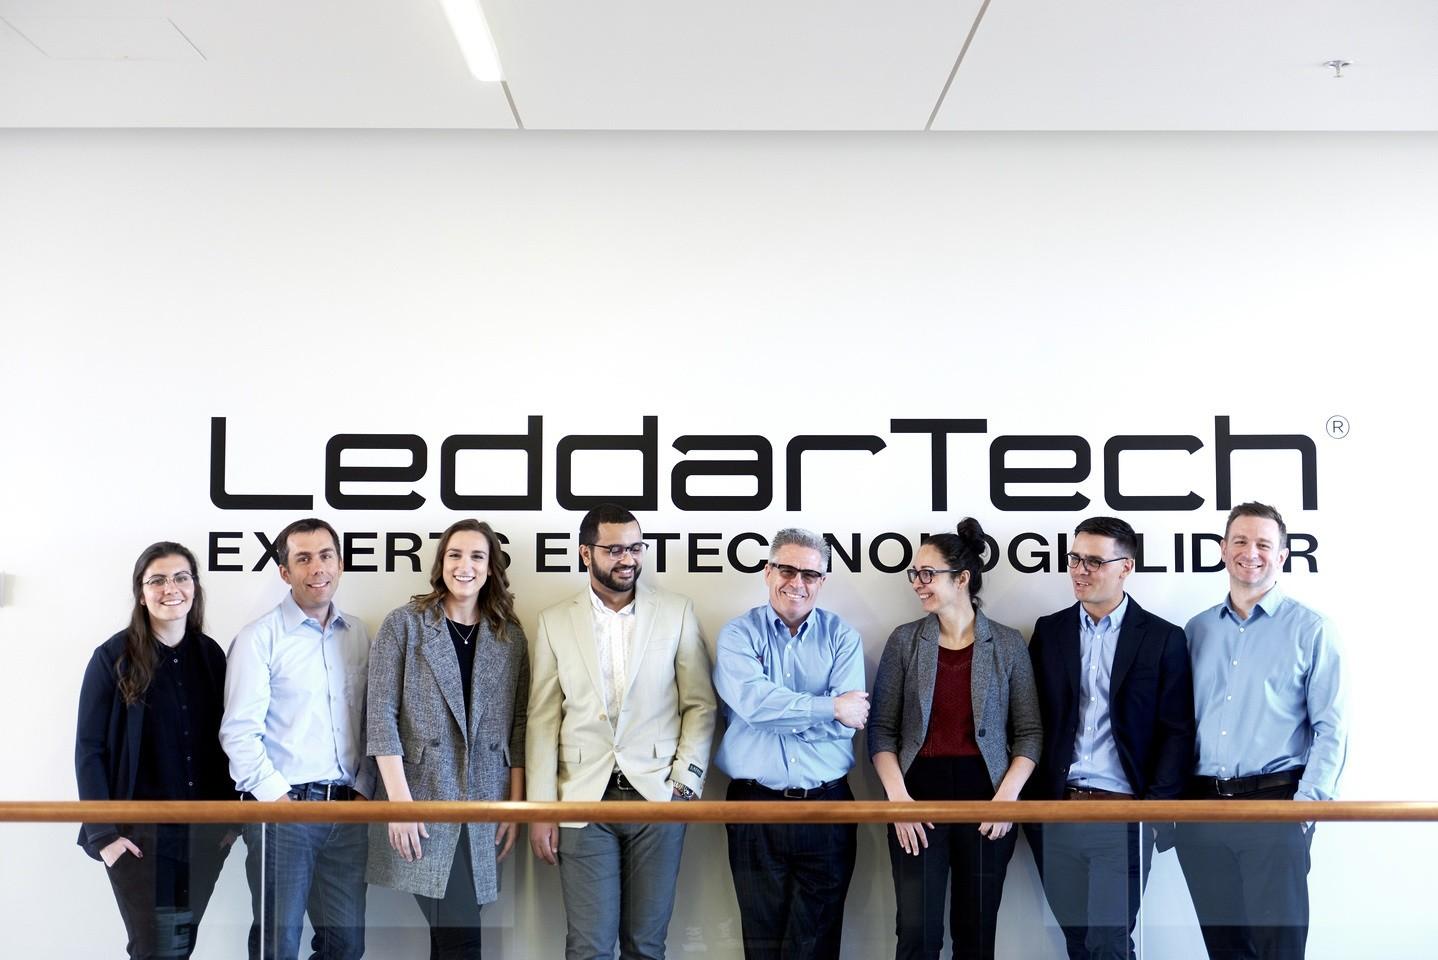 LeddarTech - Mastering Lidar Sensor Technology: Life | LinkedIn